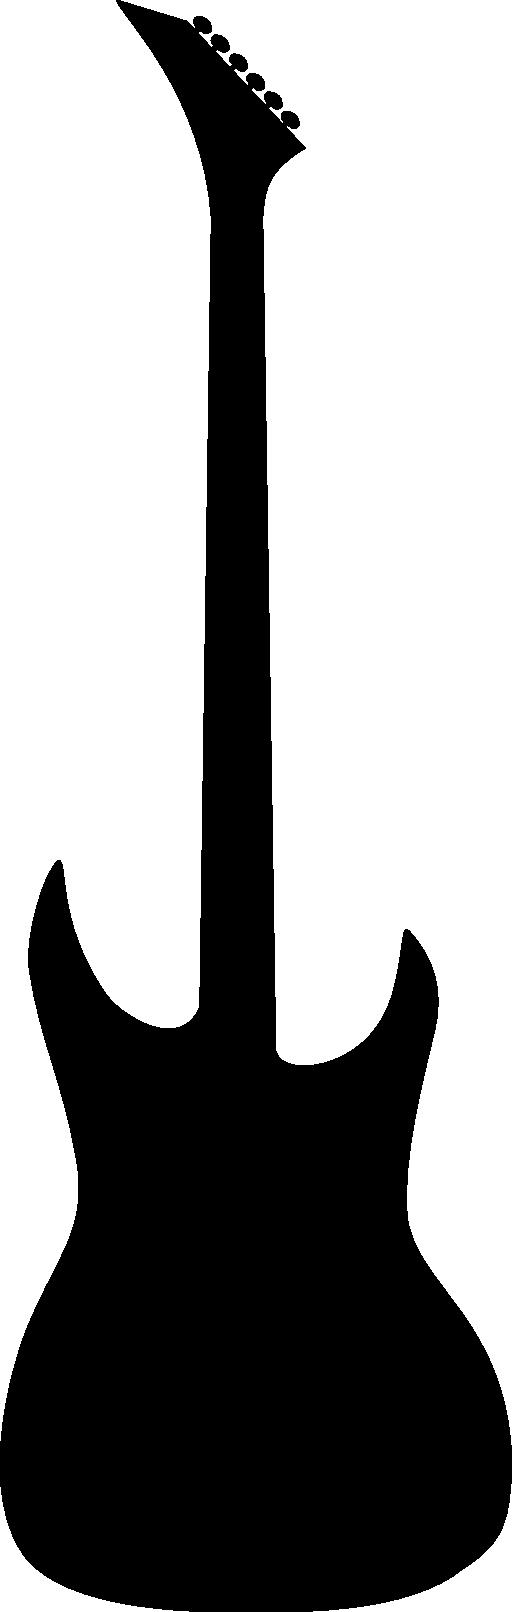 512x1612 Guitar Outline Clipart